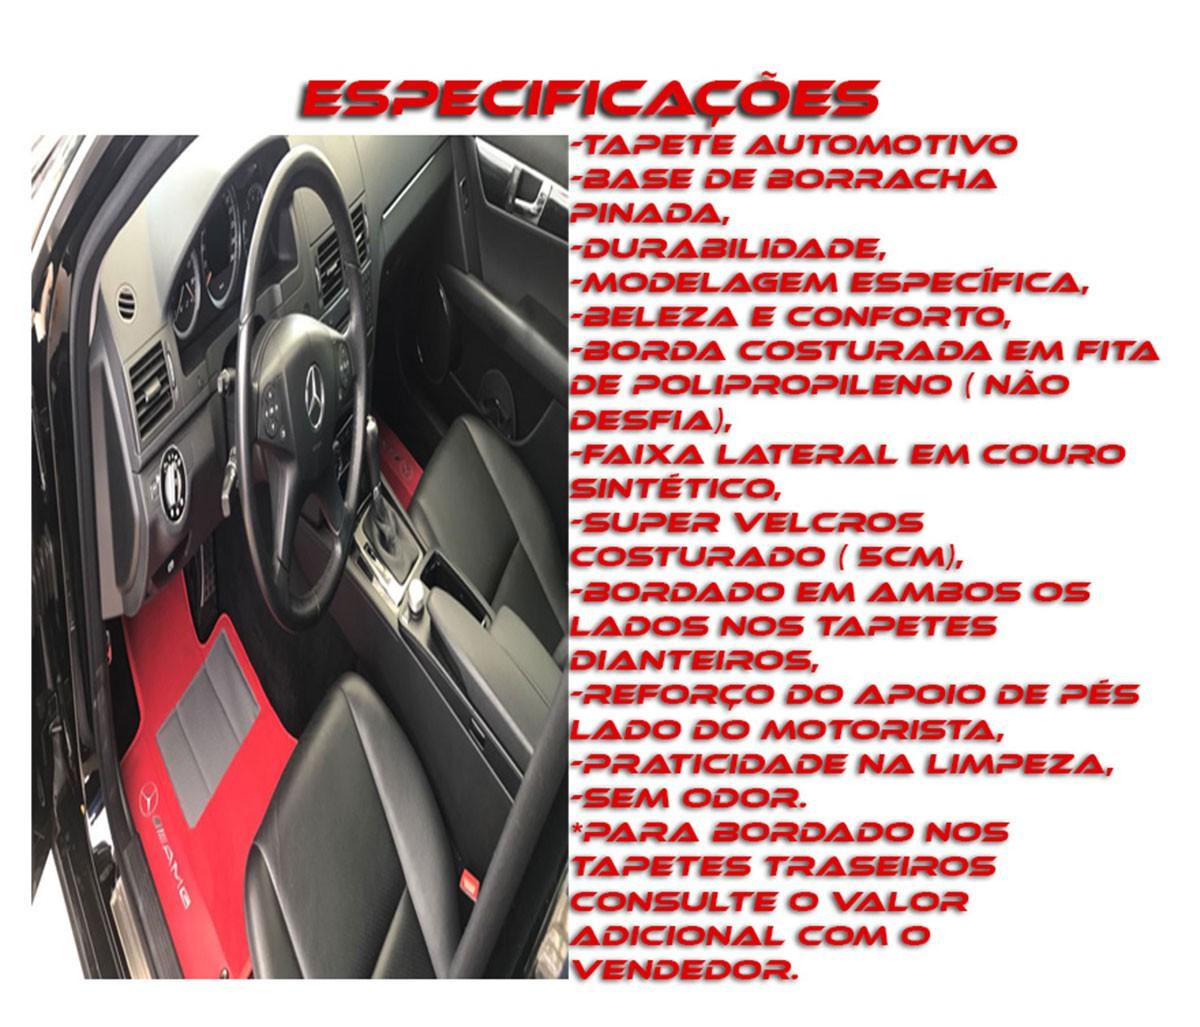 Tapete Bmw M235 Carpete Premium Base Pinada 12mm